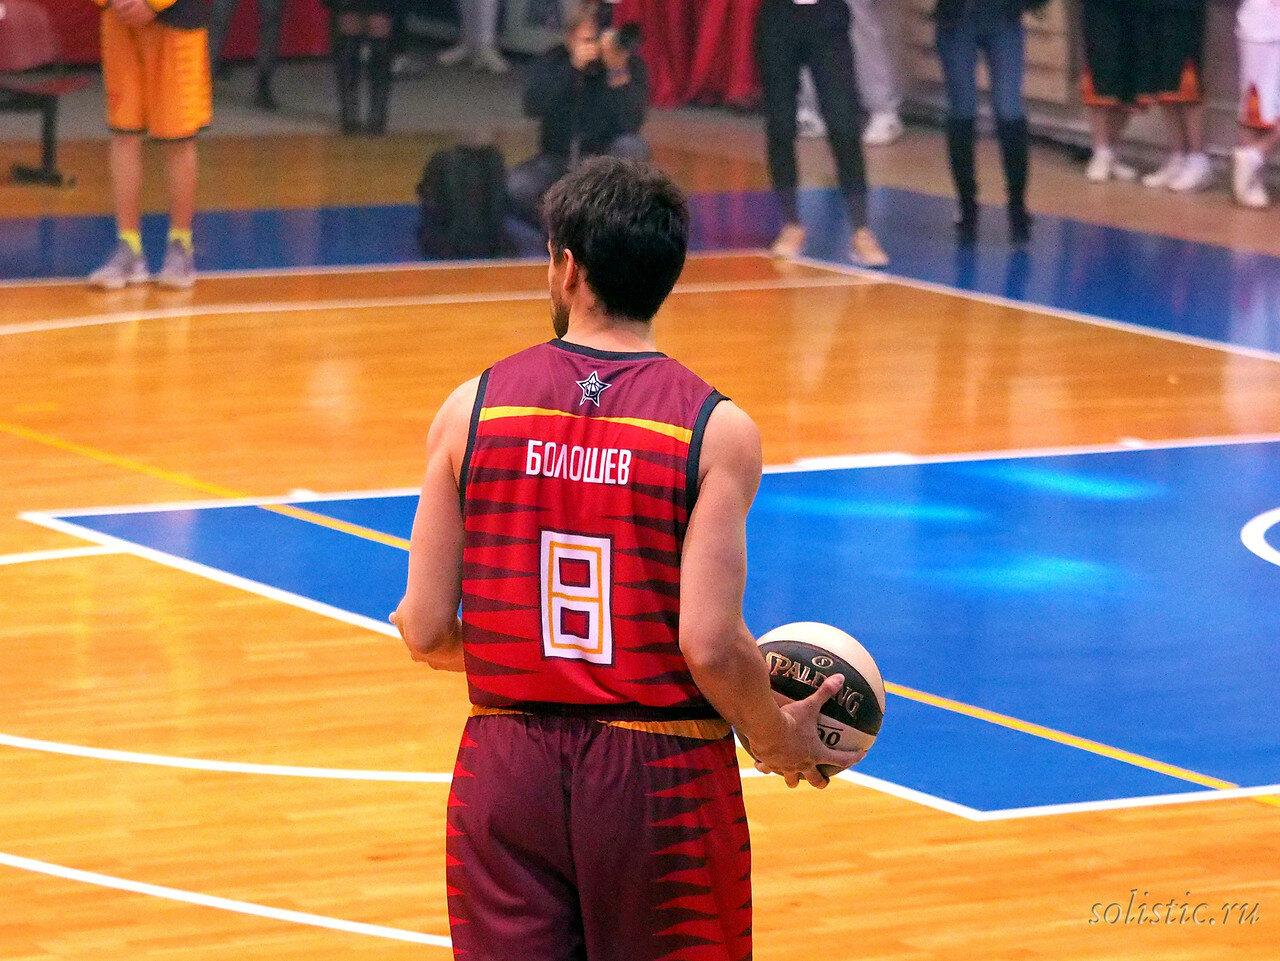 114 Матч звезд АСБ 2018 (ассоциации студенческого баскетбола)